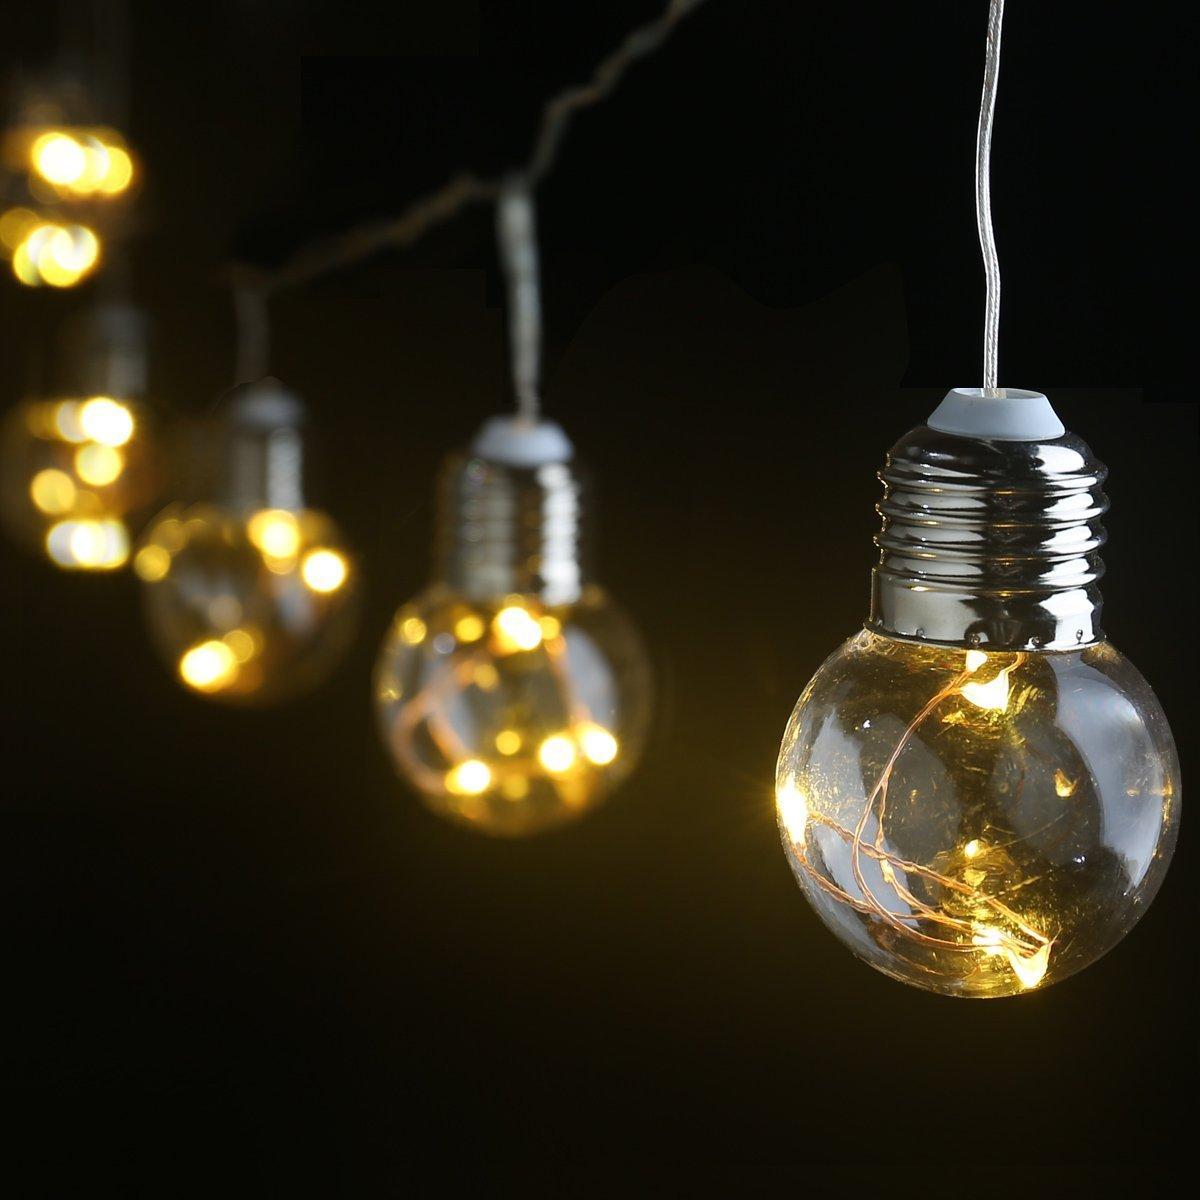 le guirnalda led m bombillas g luces de bajo consumo exterior interior